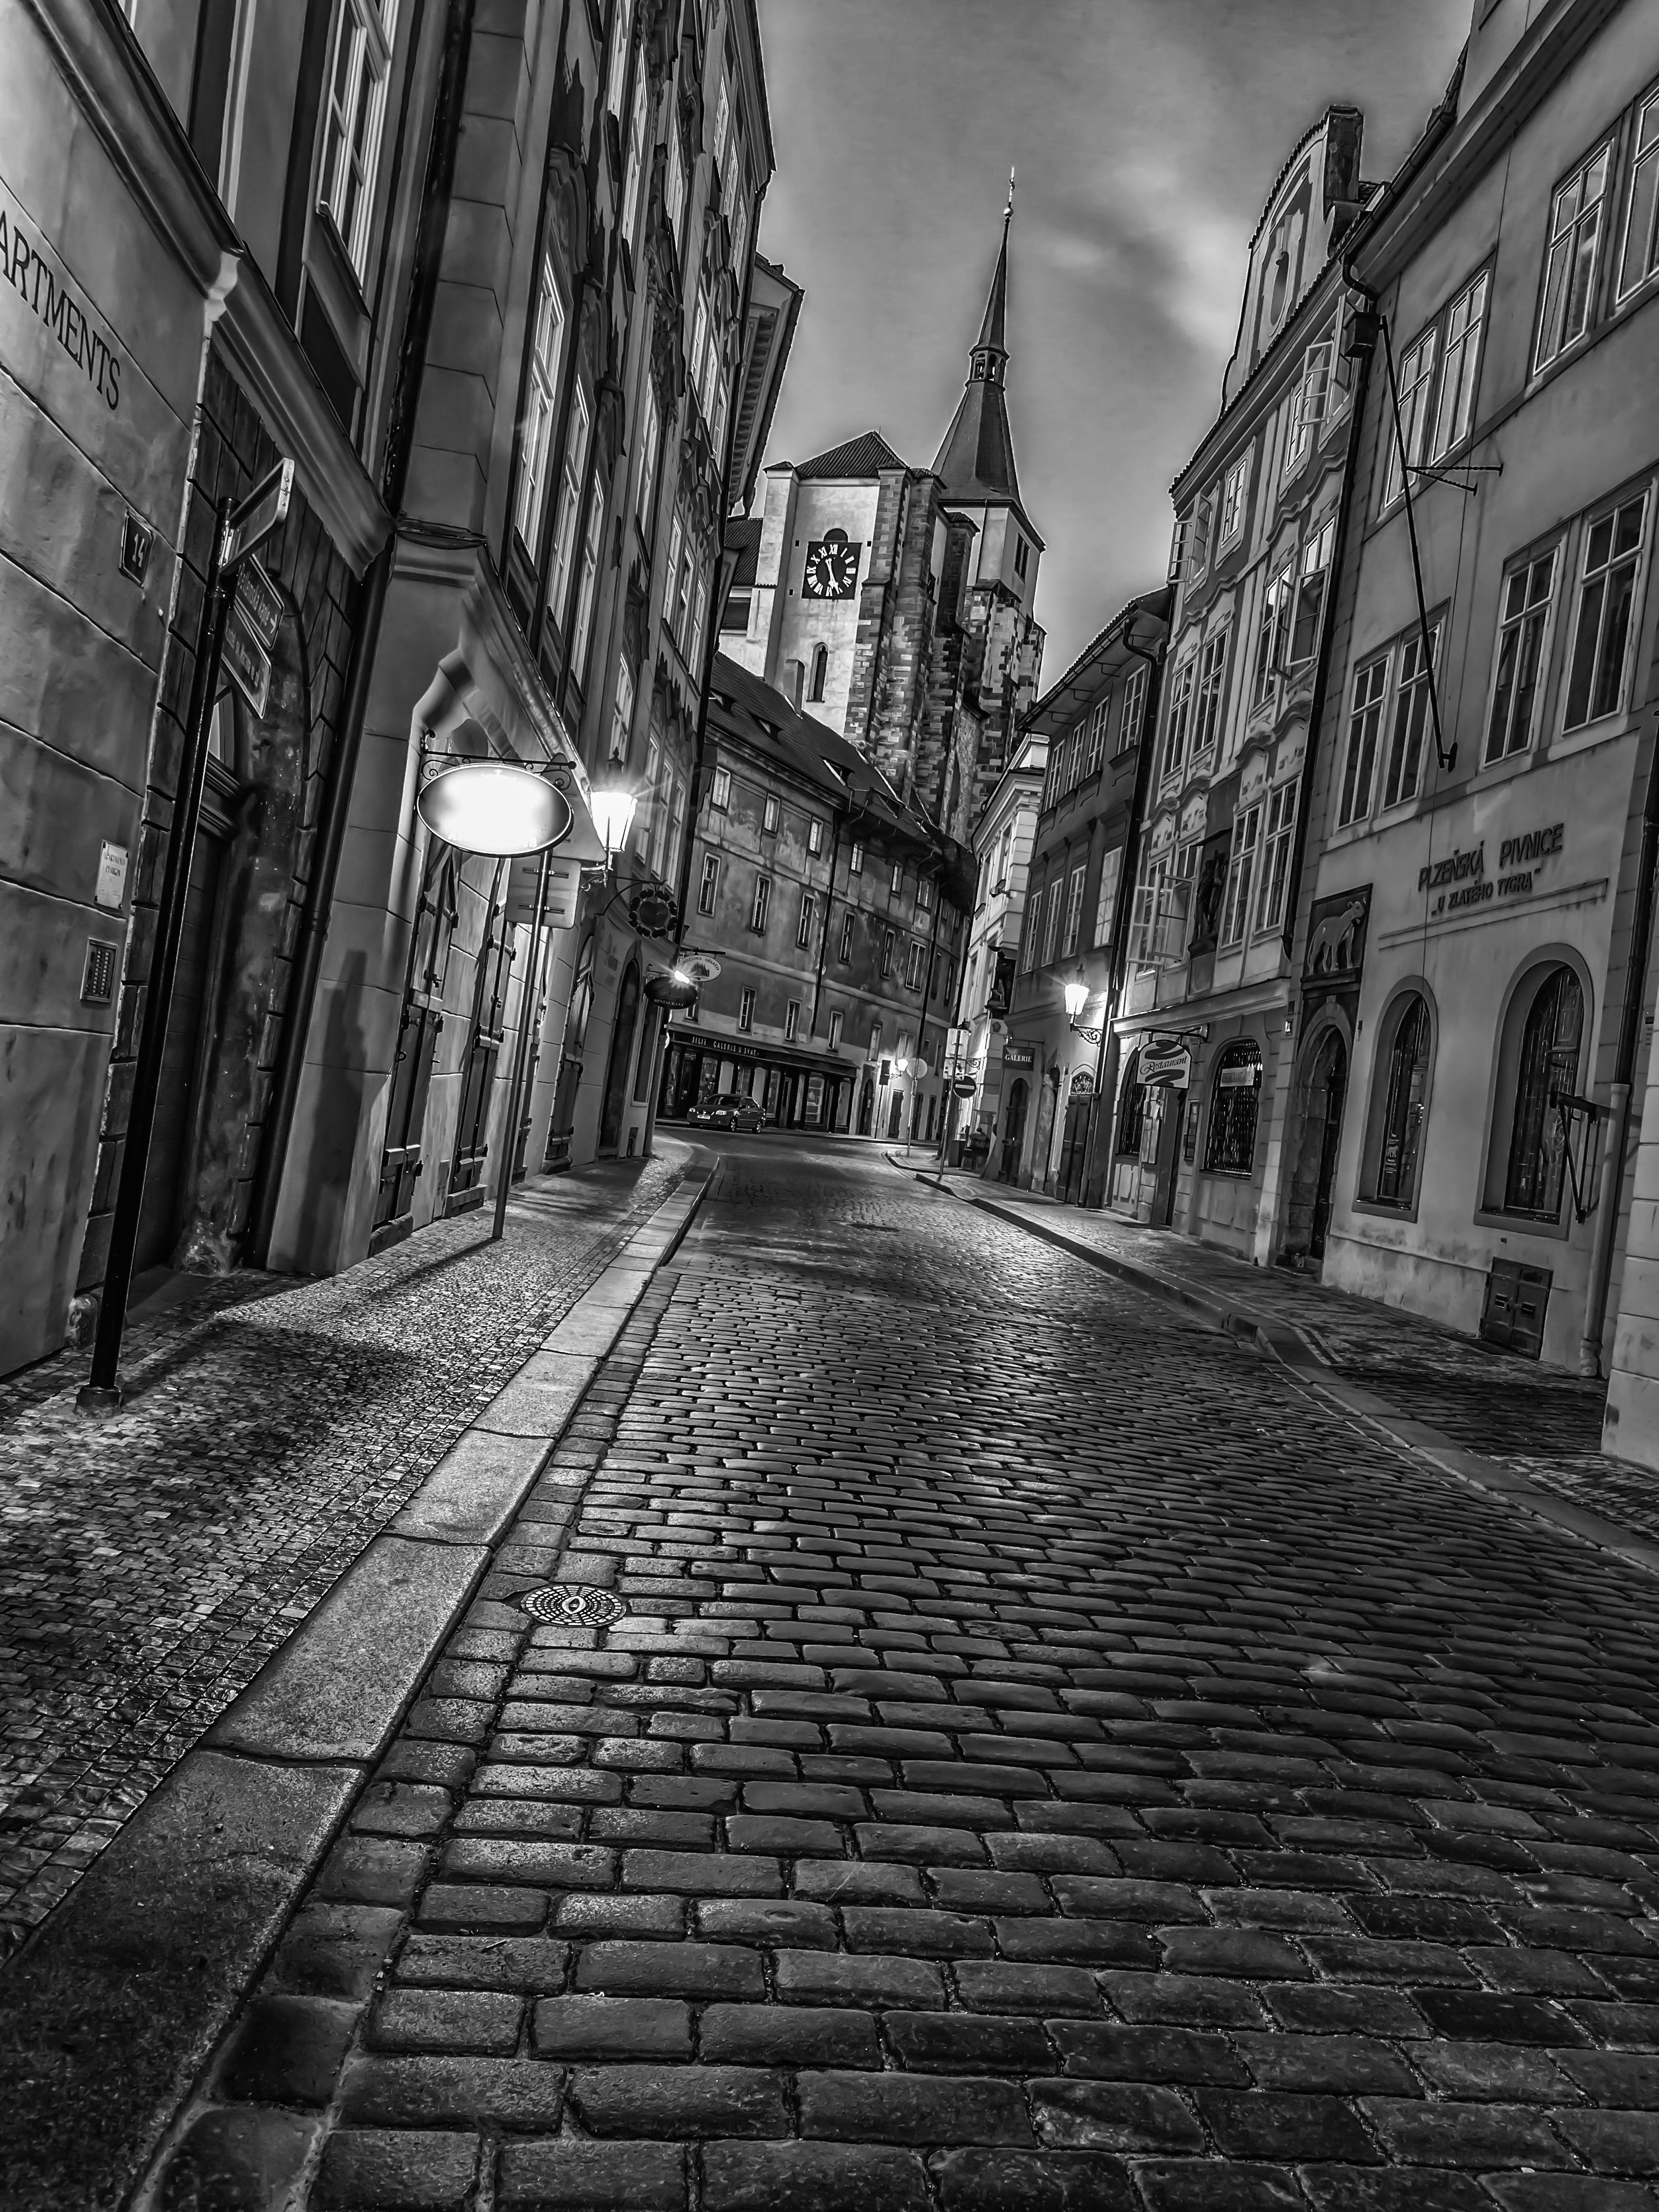 Night light wikipedia - File Prague Street At Night Light Cityscape 8348414087 Jpg